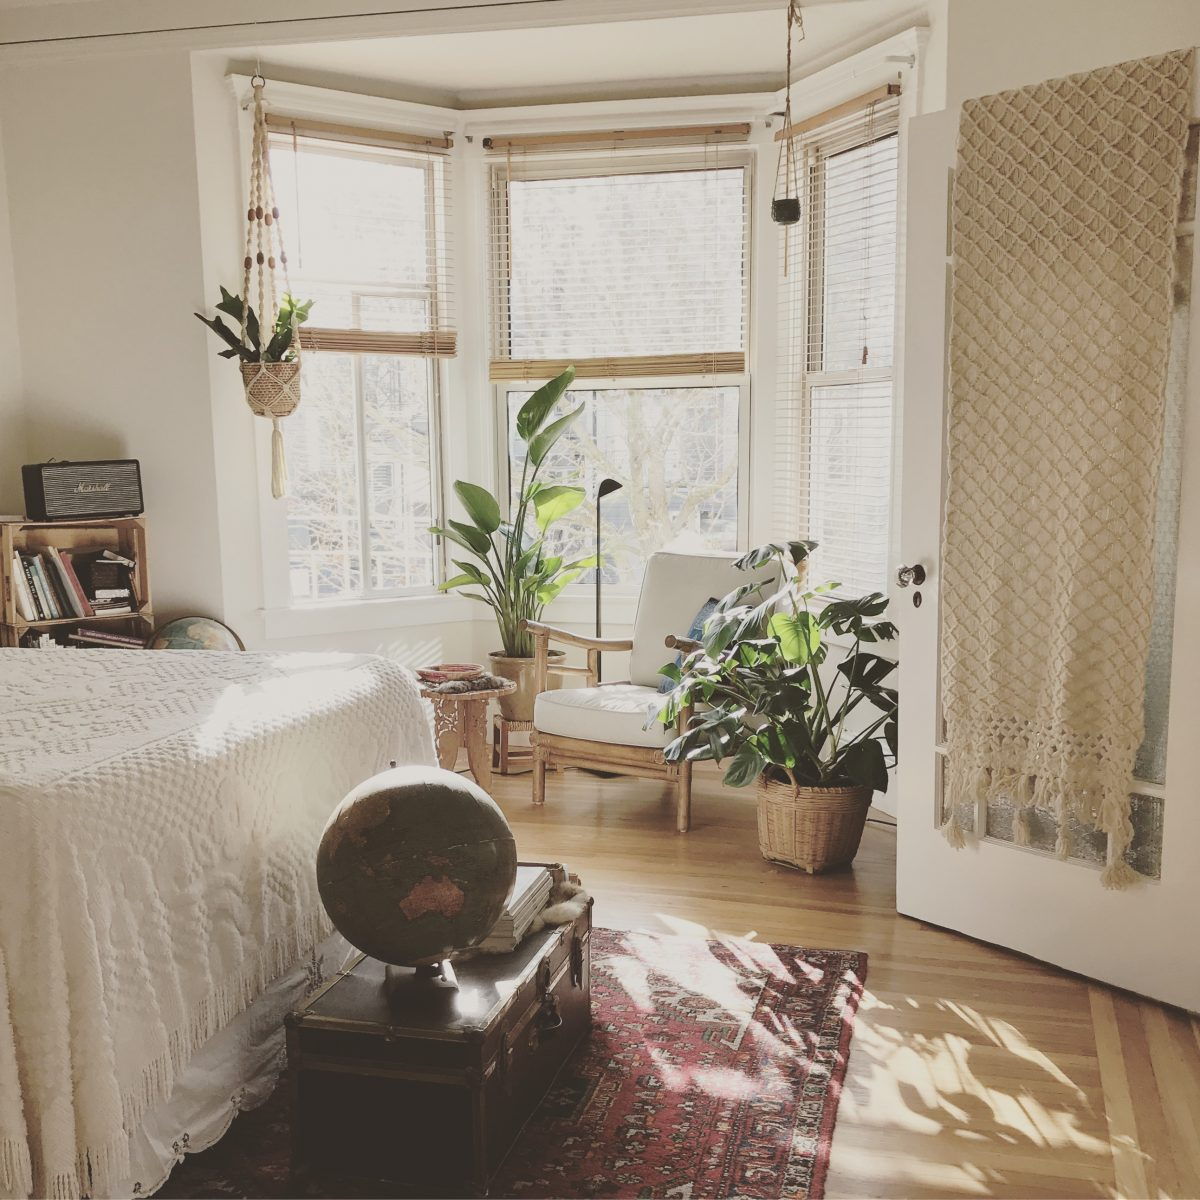 Wohnung trotz Schufa Auskunft